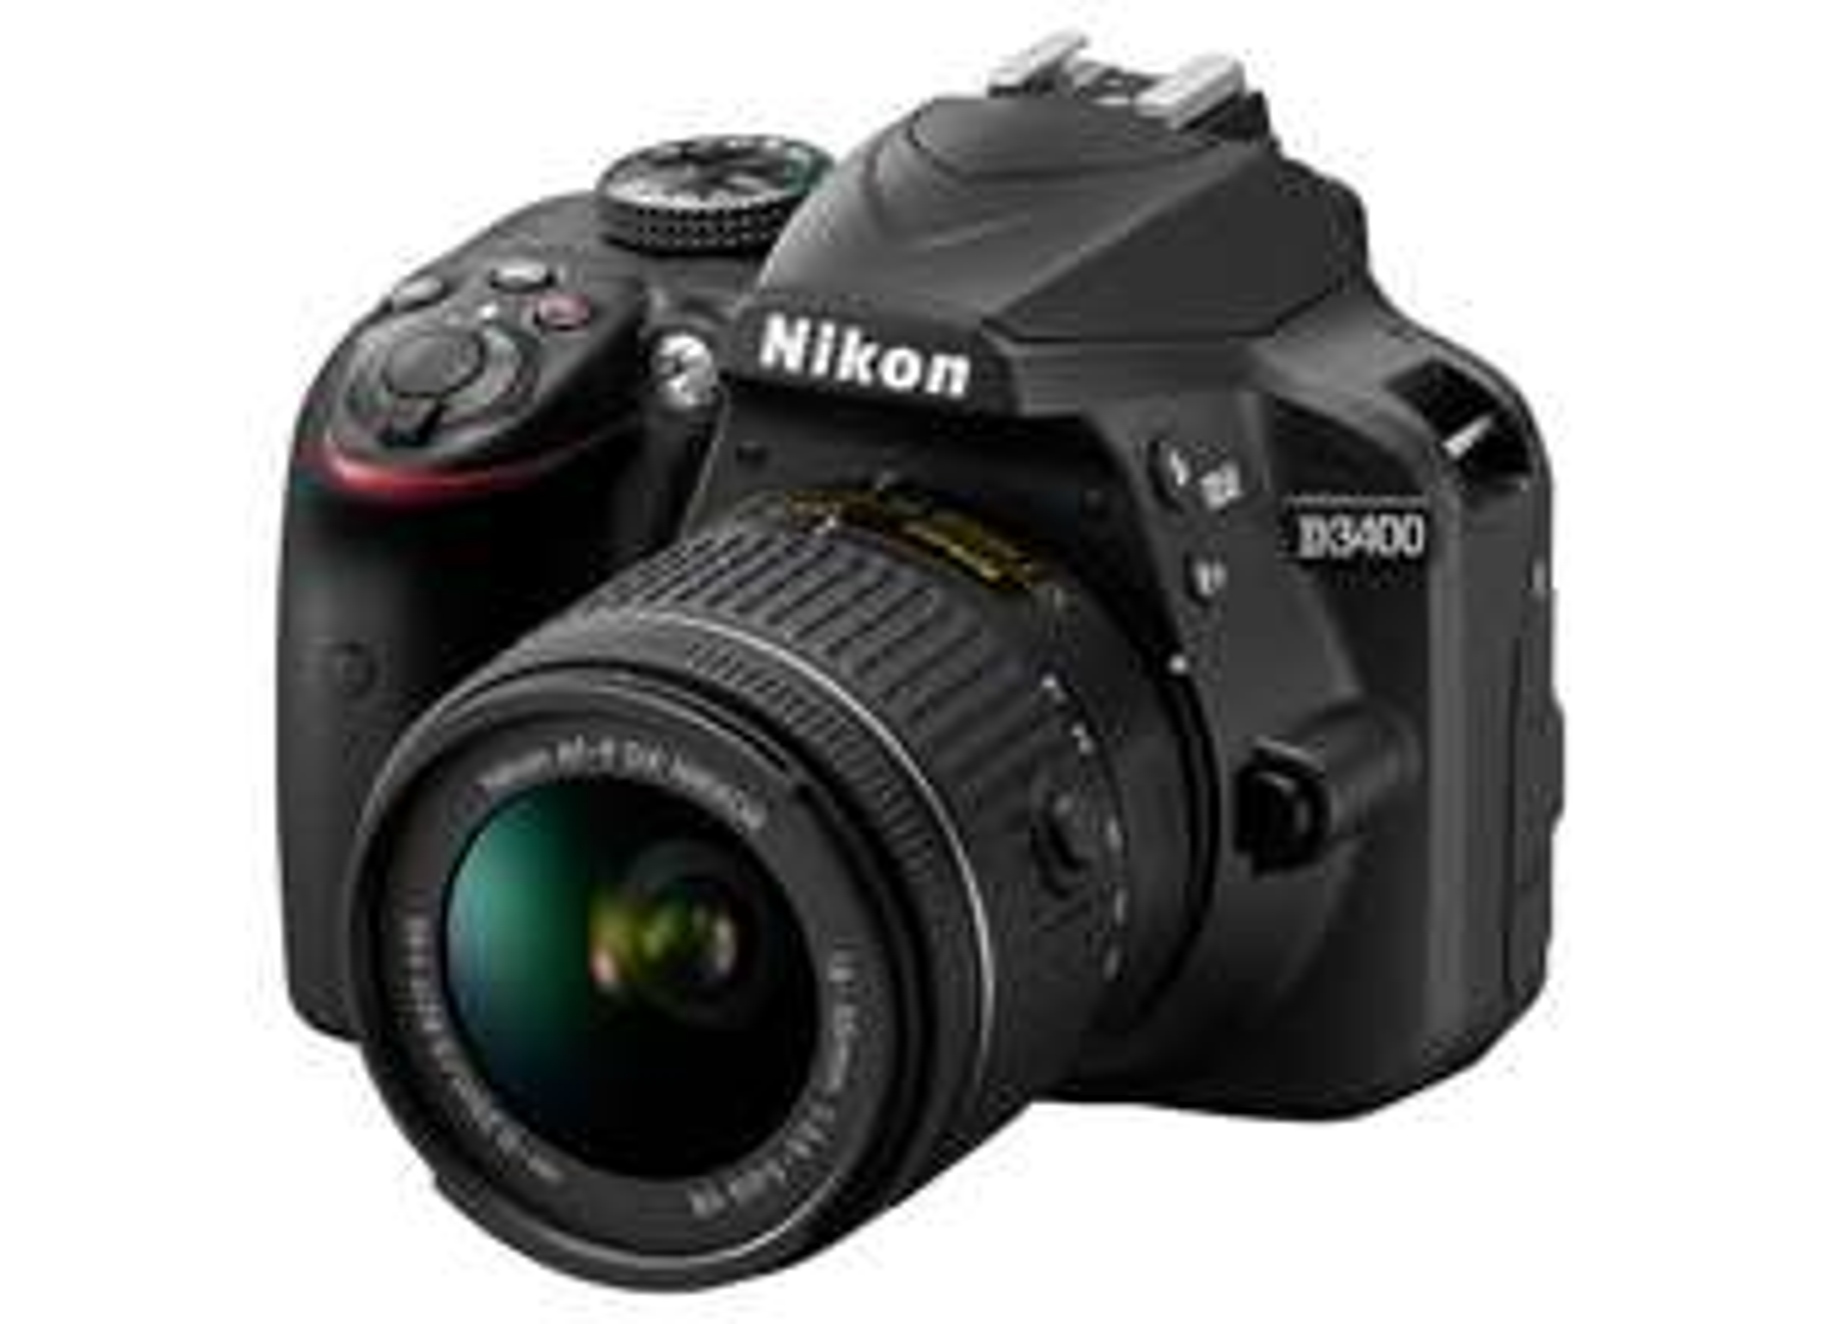 Nikon D3400 DSLR with 18-55mm VR Lens £374 with code @ Argos / John Lewis